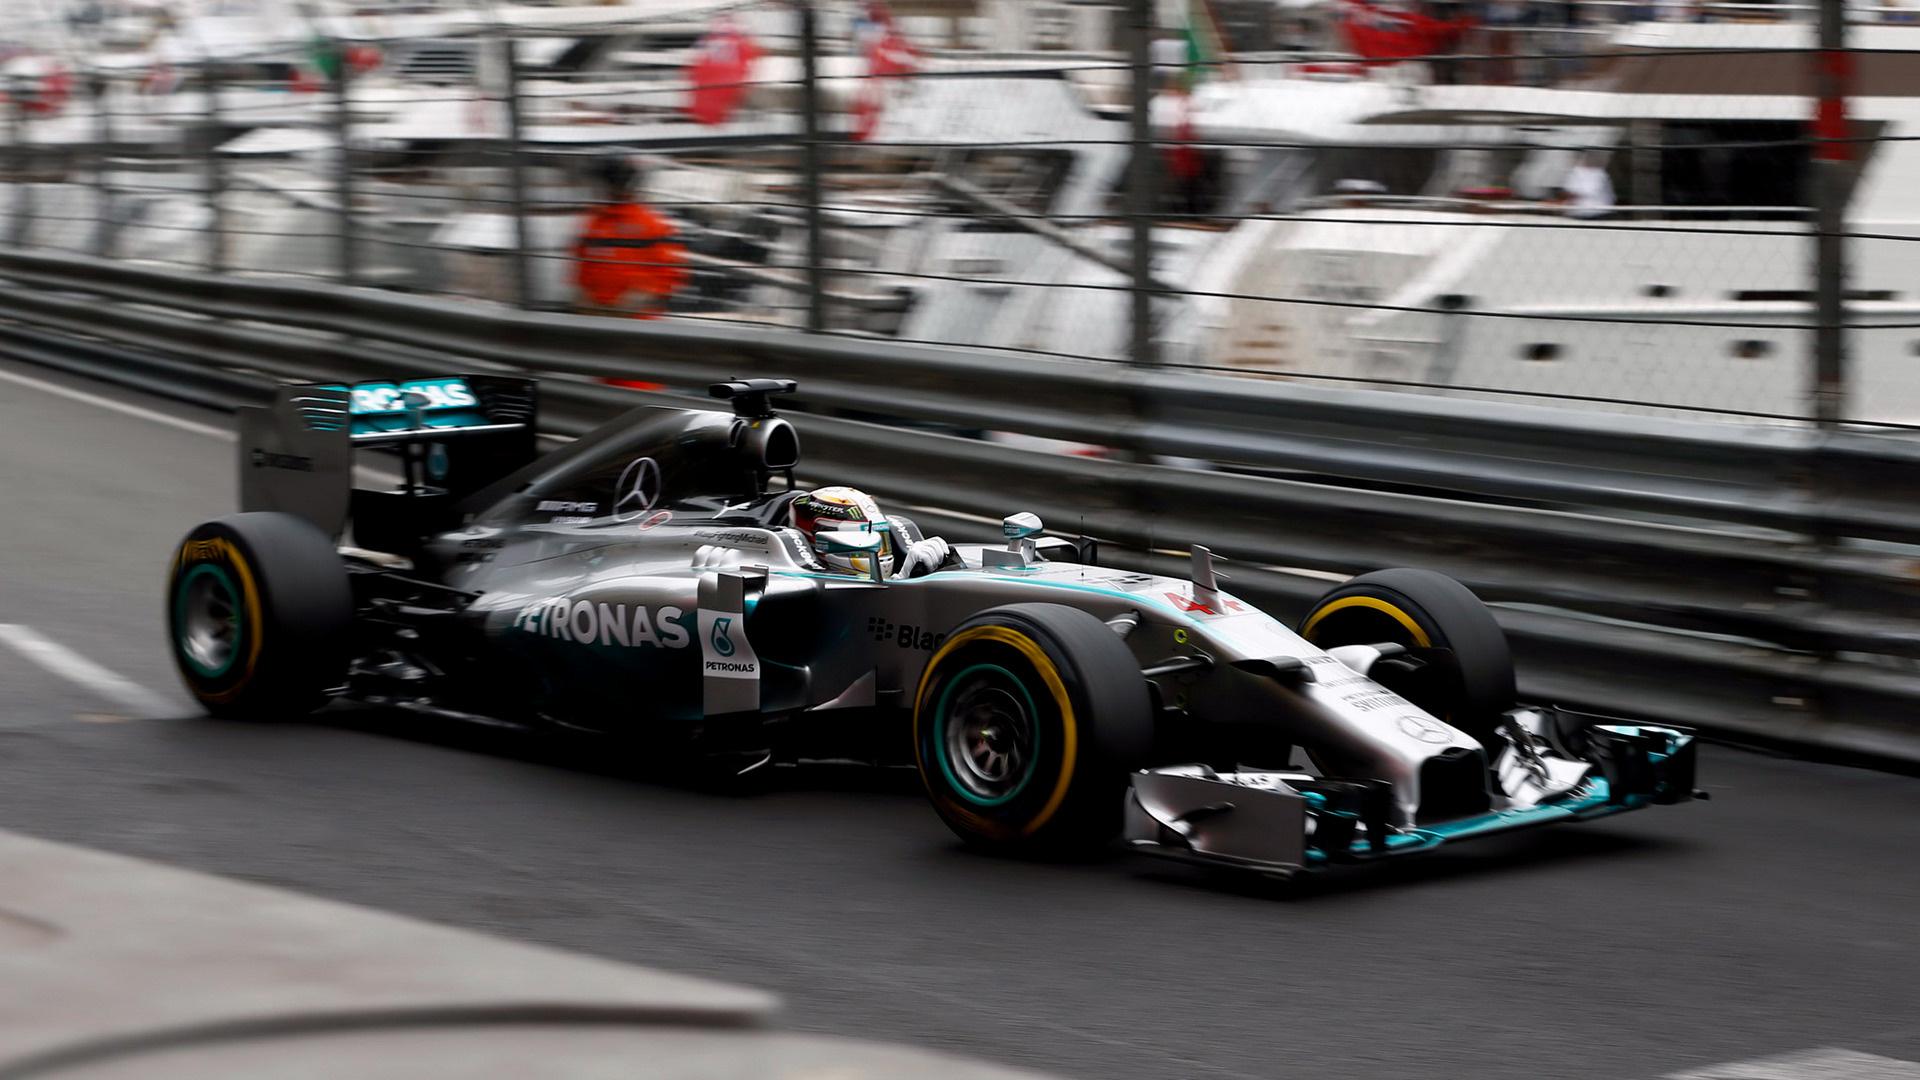 Mercedes AMG F1 Wallpaper - WallpaperSafari